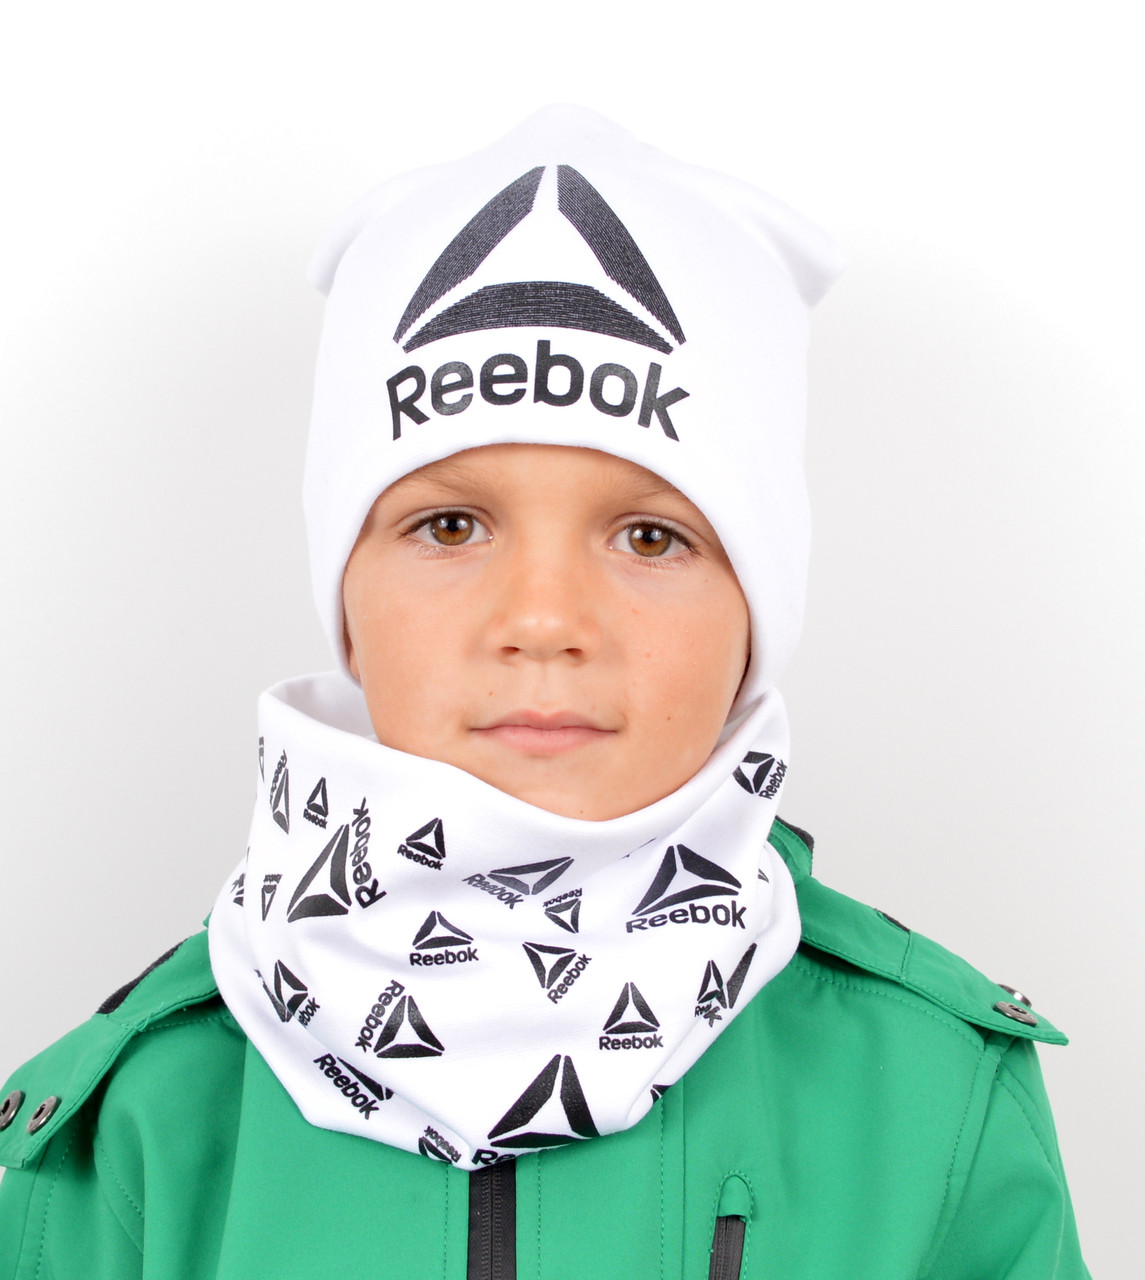 Трикотажный комплект Reebok шапка+хомут